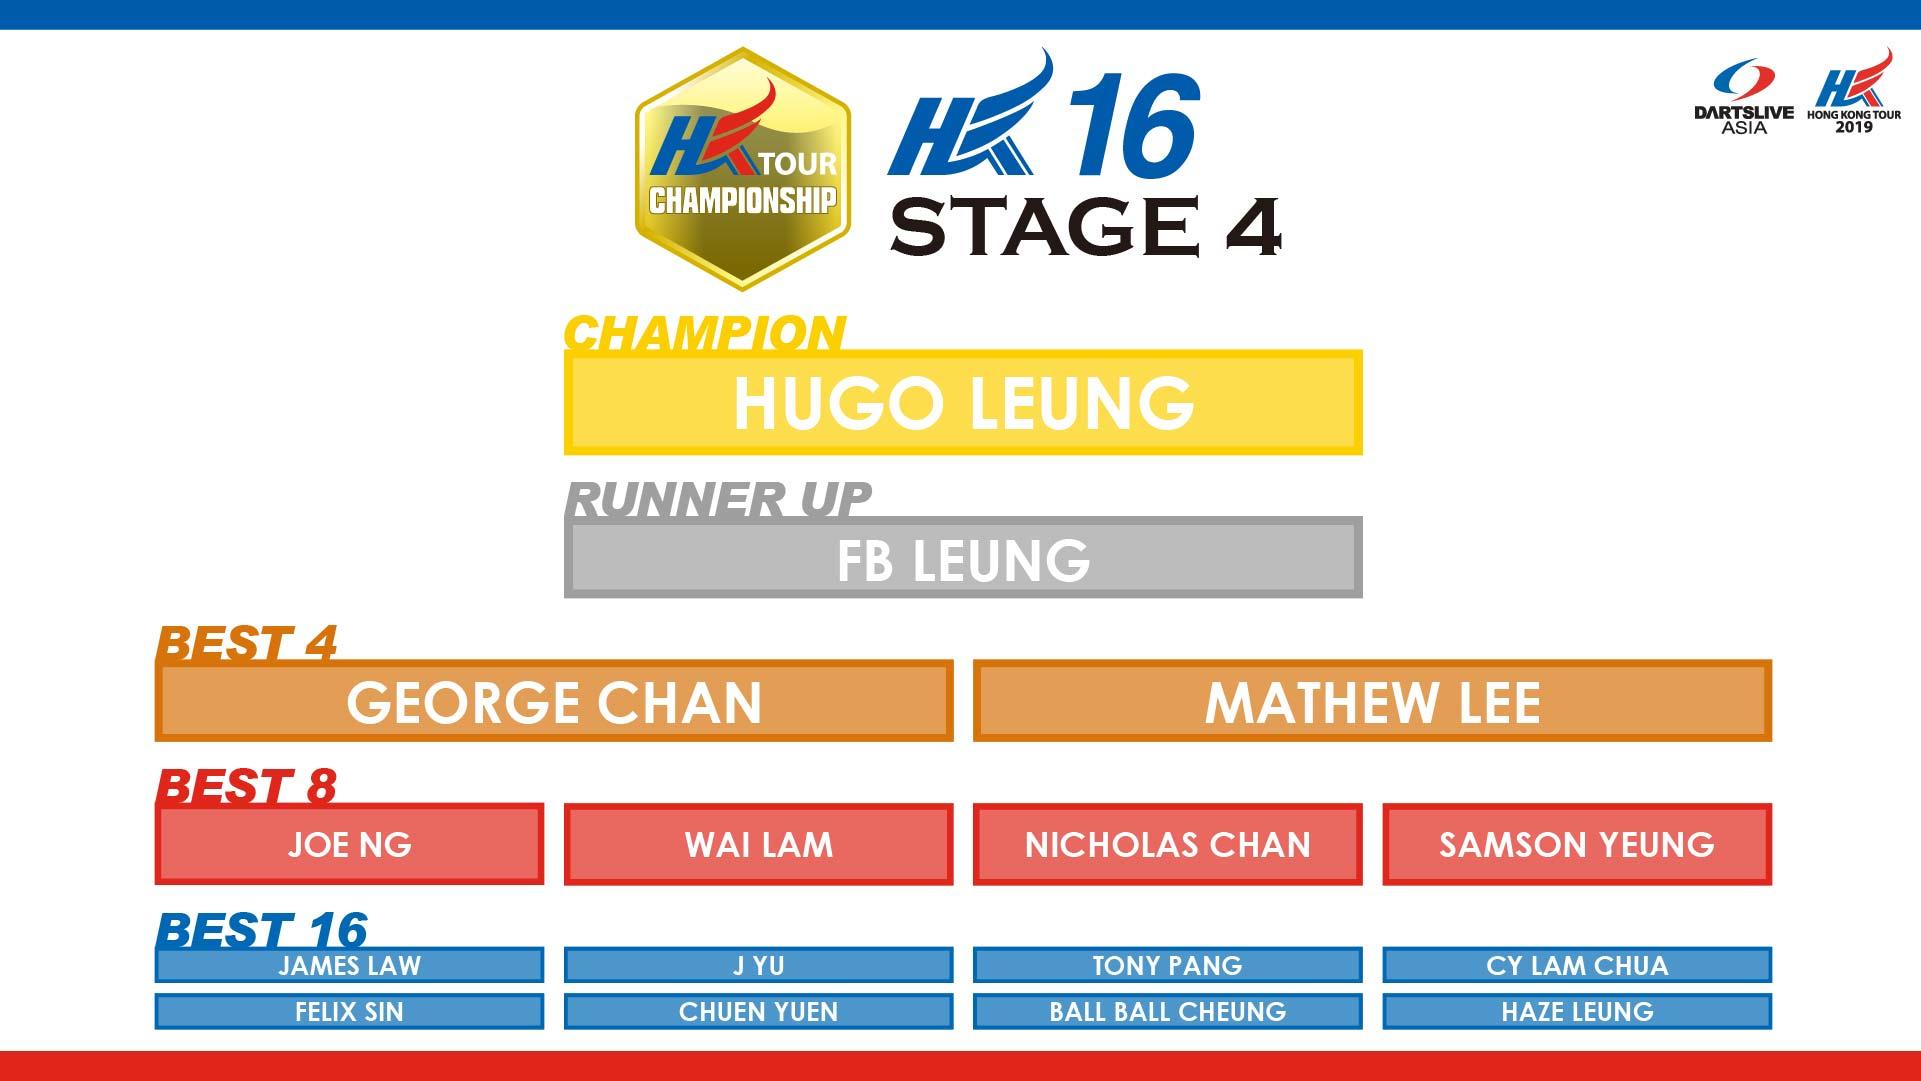 HKTCS 2019 STAGE 4 hk16 RESULT